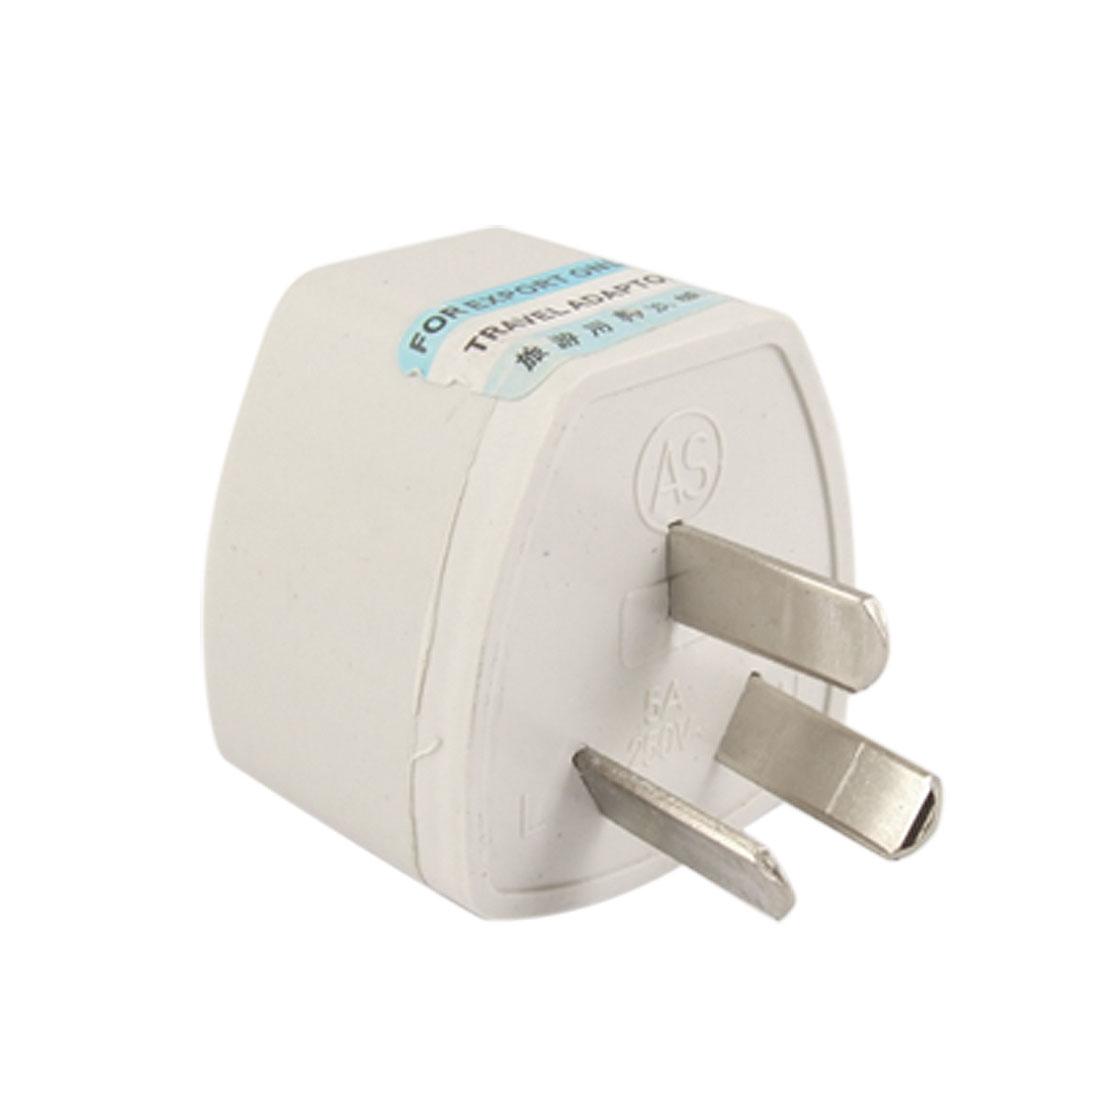 AC 250V 5A Travel AU 3 Pin Plug to EU UK US Socket Power Adapter